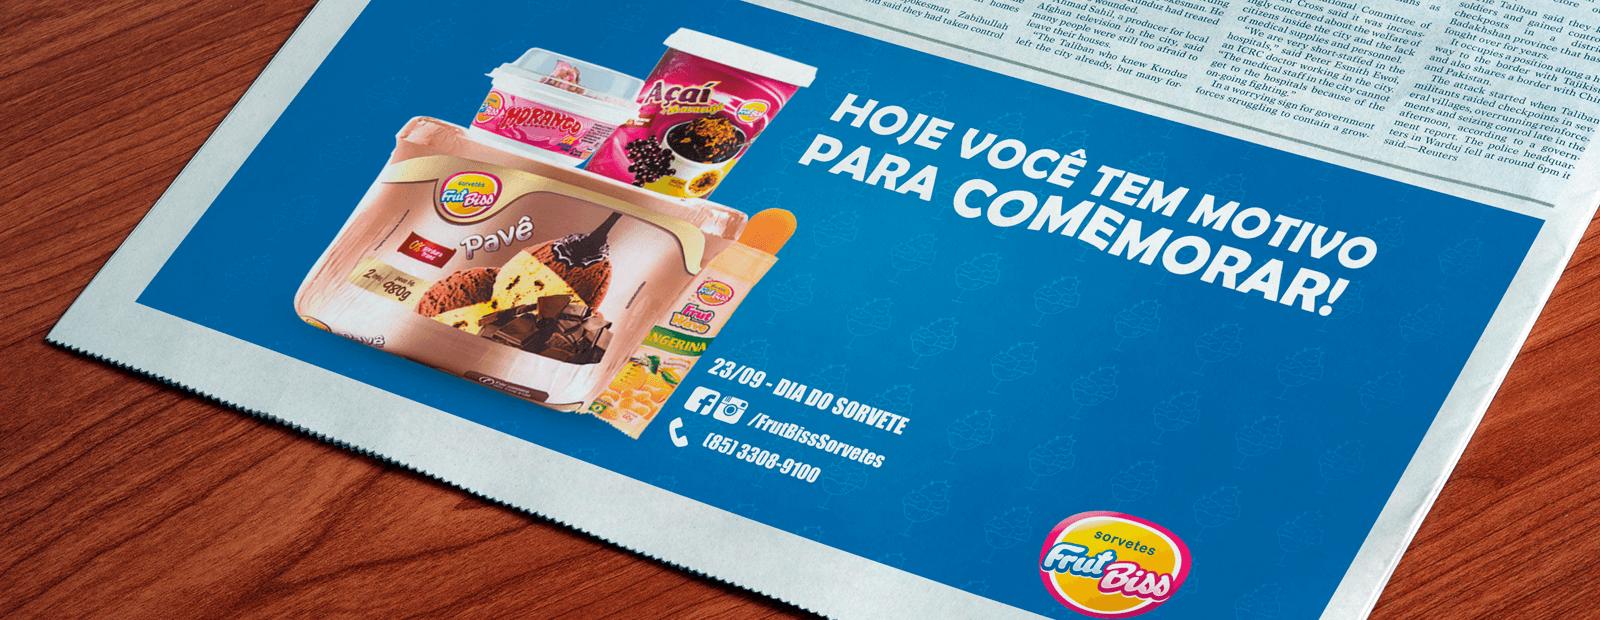 anuncio-jornal-frubiss